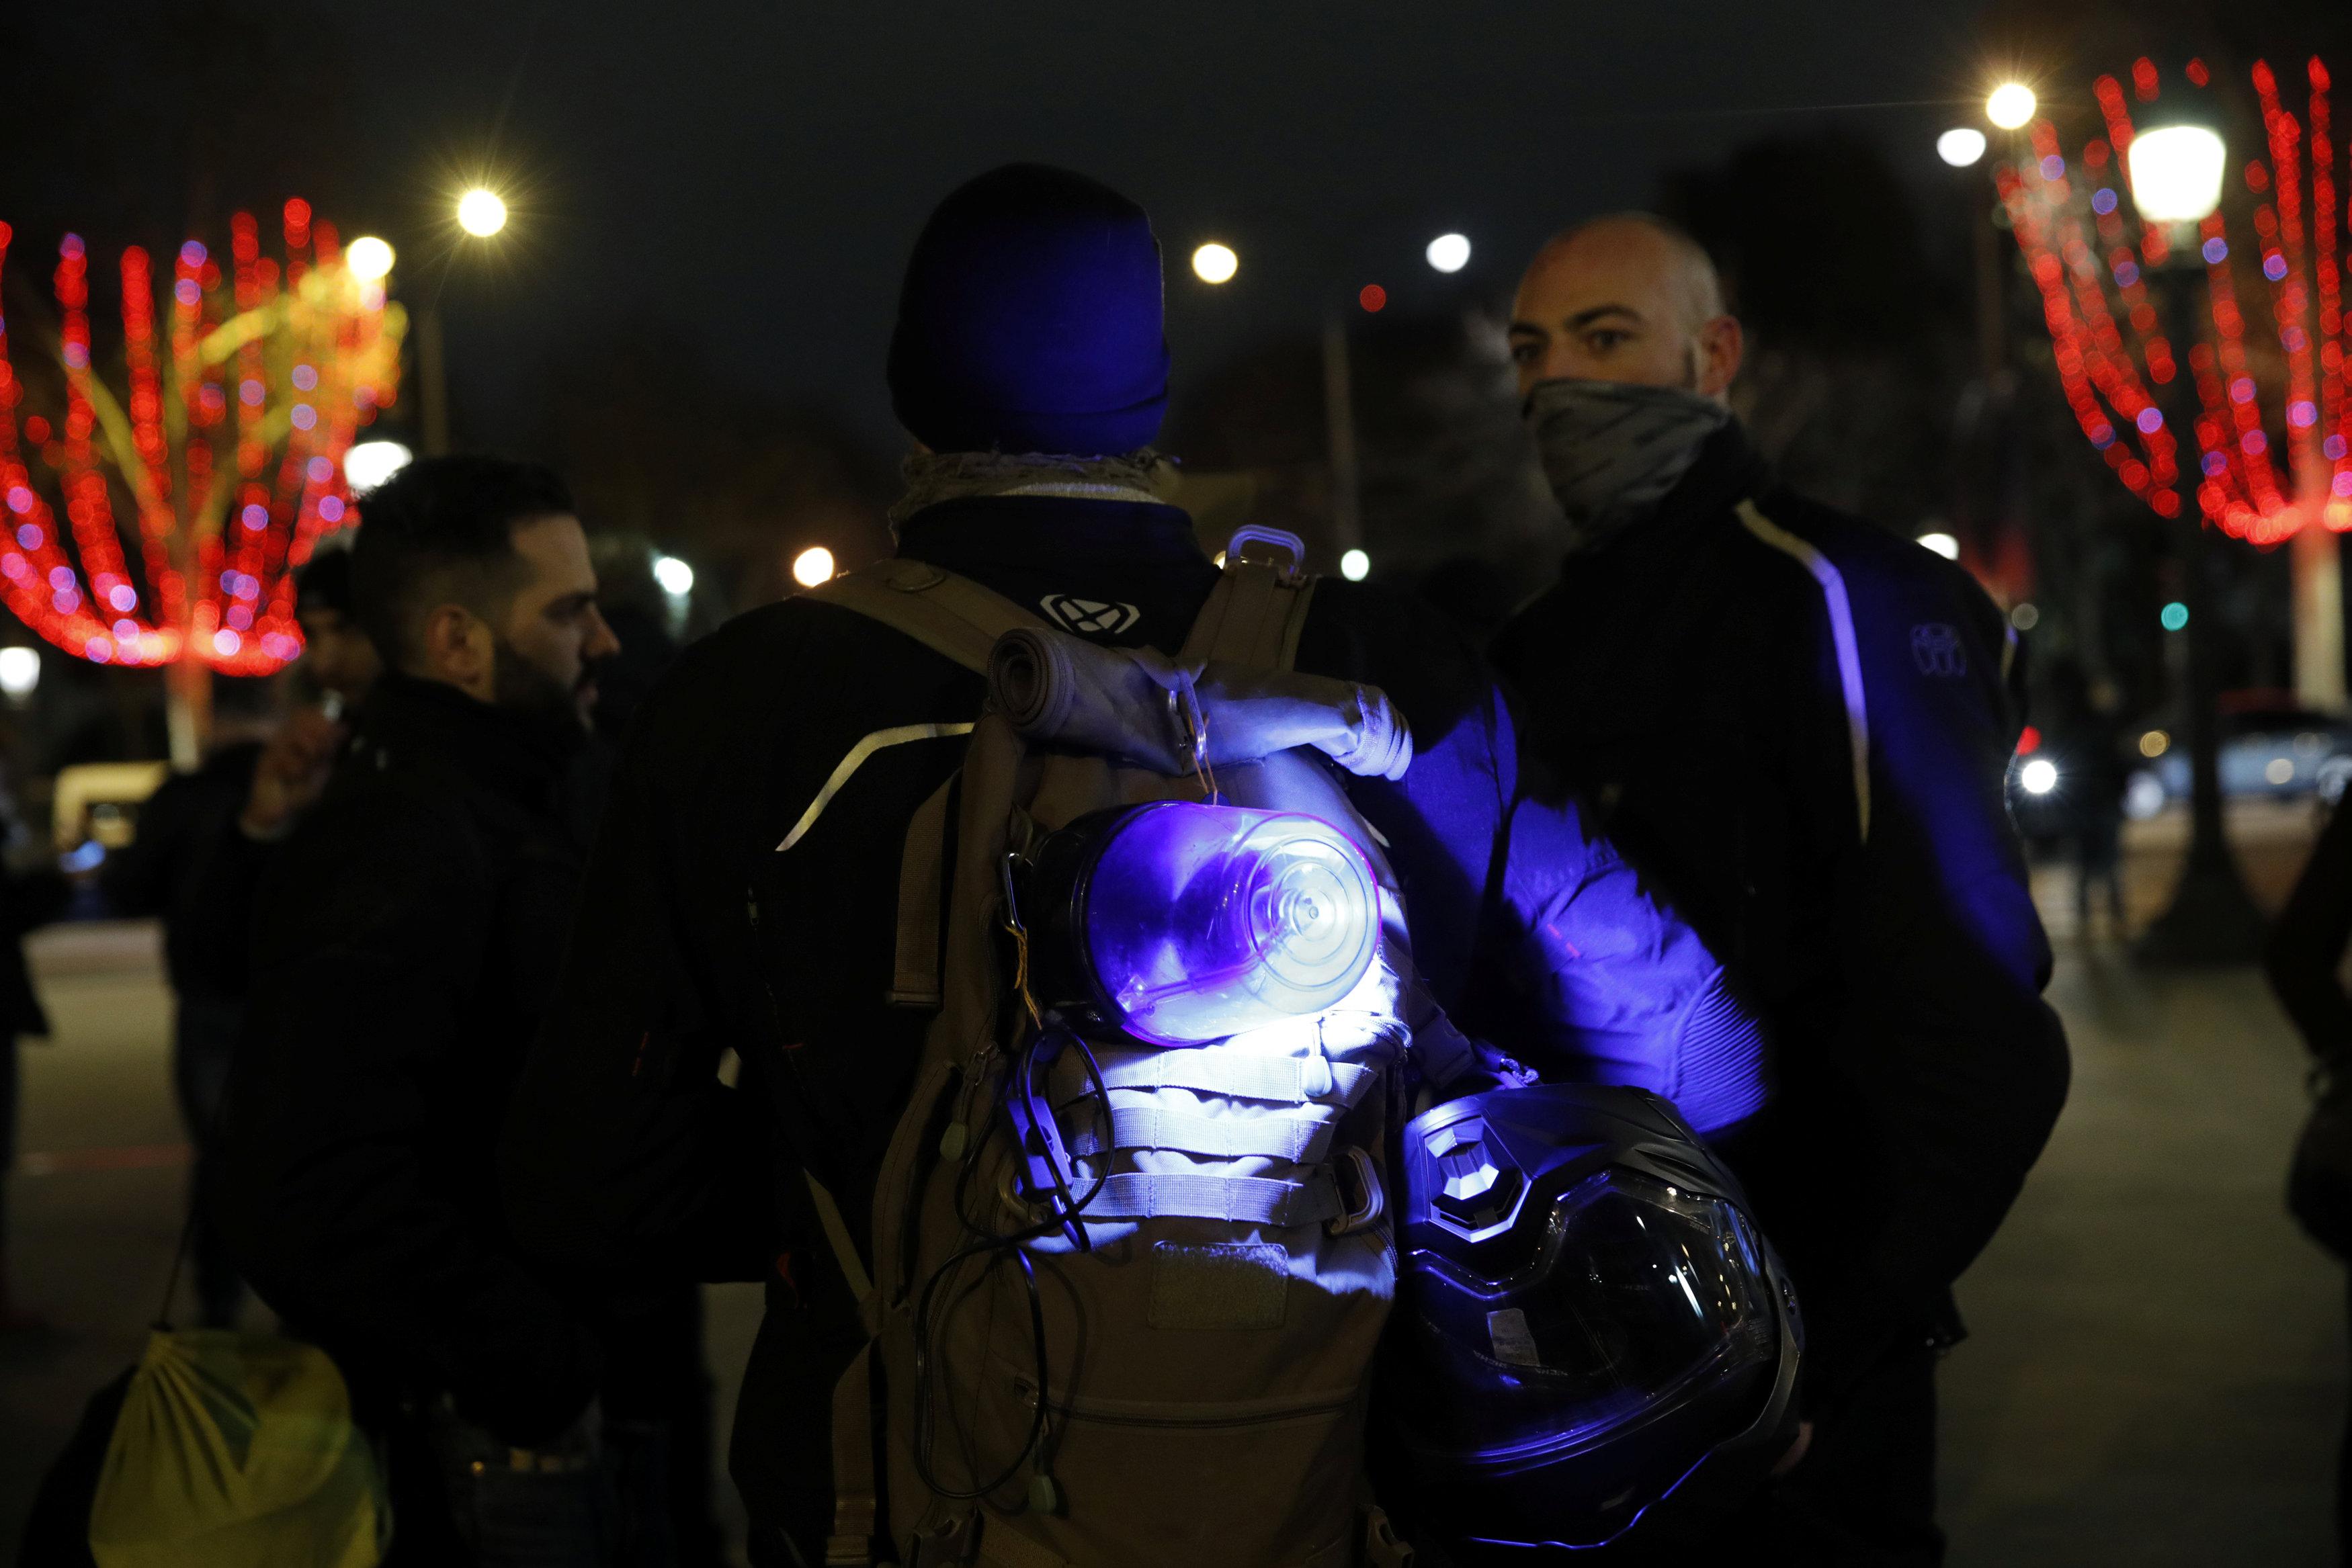 2018-12-20T222907Z_1644579437_RC18206F5B00_RTRMADP_3_FRANCE-PROTESTS-POLICE